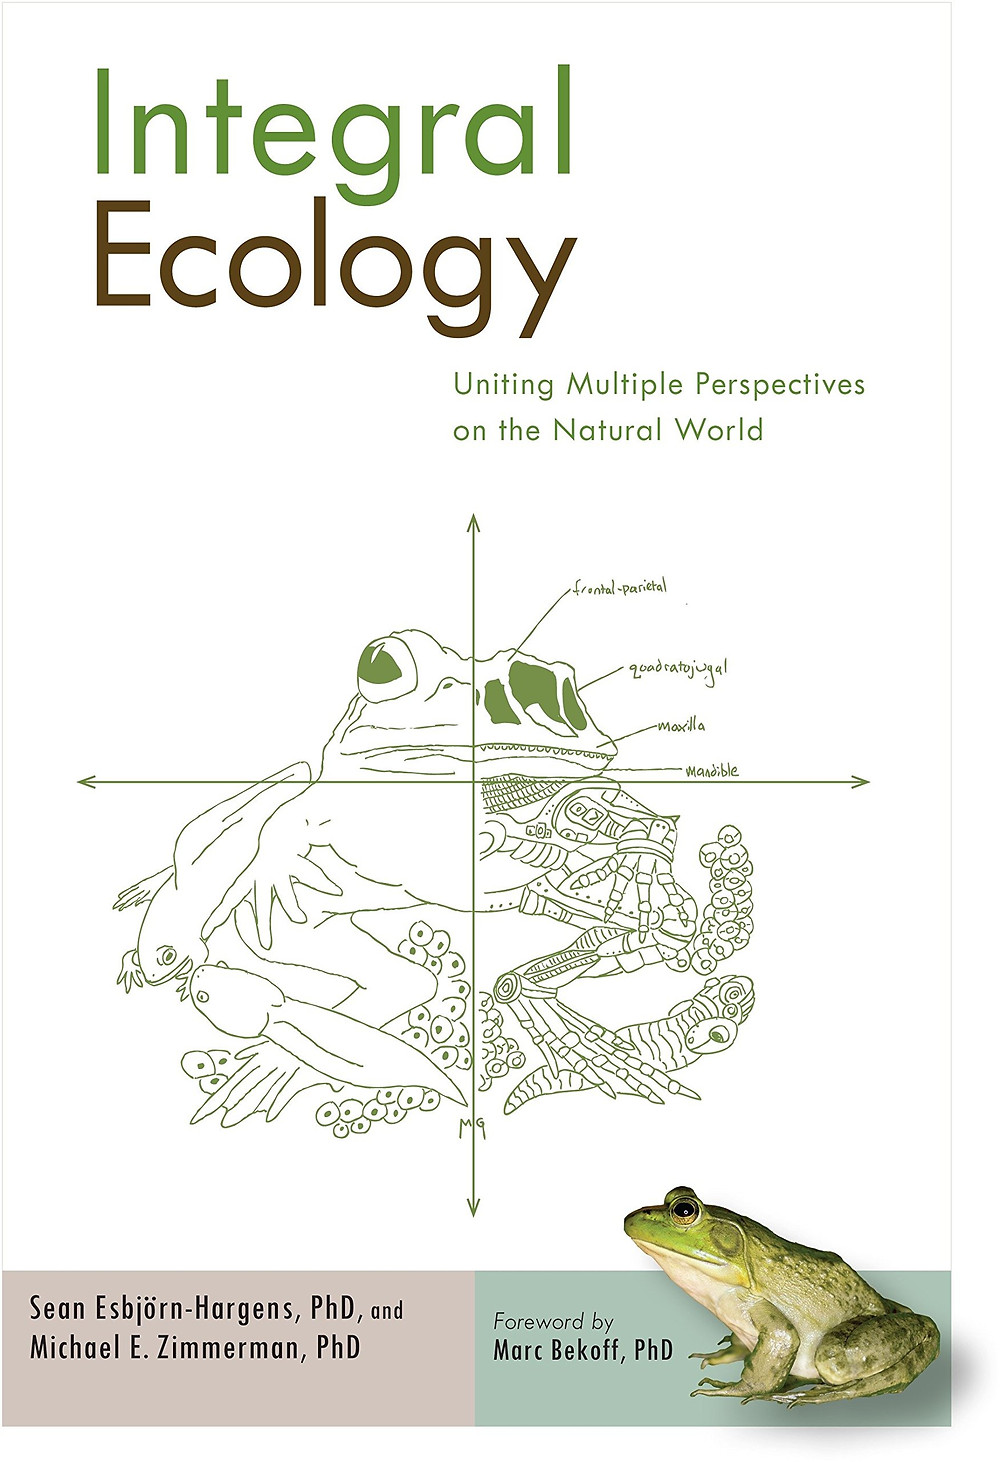 Обложка книги Шона Эсбьорна-Харгенса и Майкла Зиммермана «Интегральная экология» (Esbjörn-Hargens S., Zimmerman M. Integral Ecology: Uniting Multiple Perspectives on the Natural World. — Boston & London: Integral Books, Shambhala Publications, 2011).